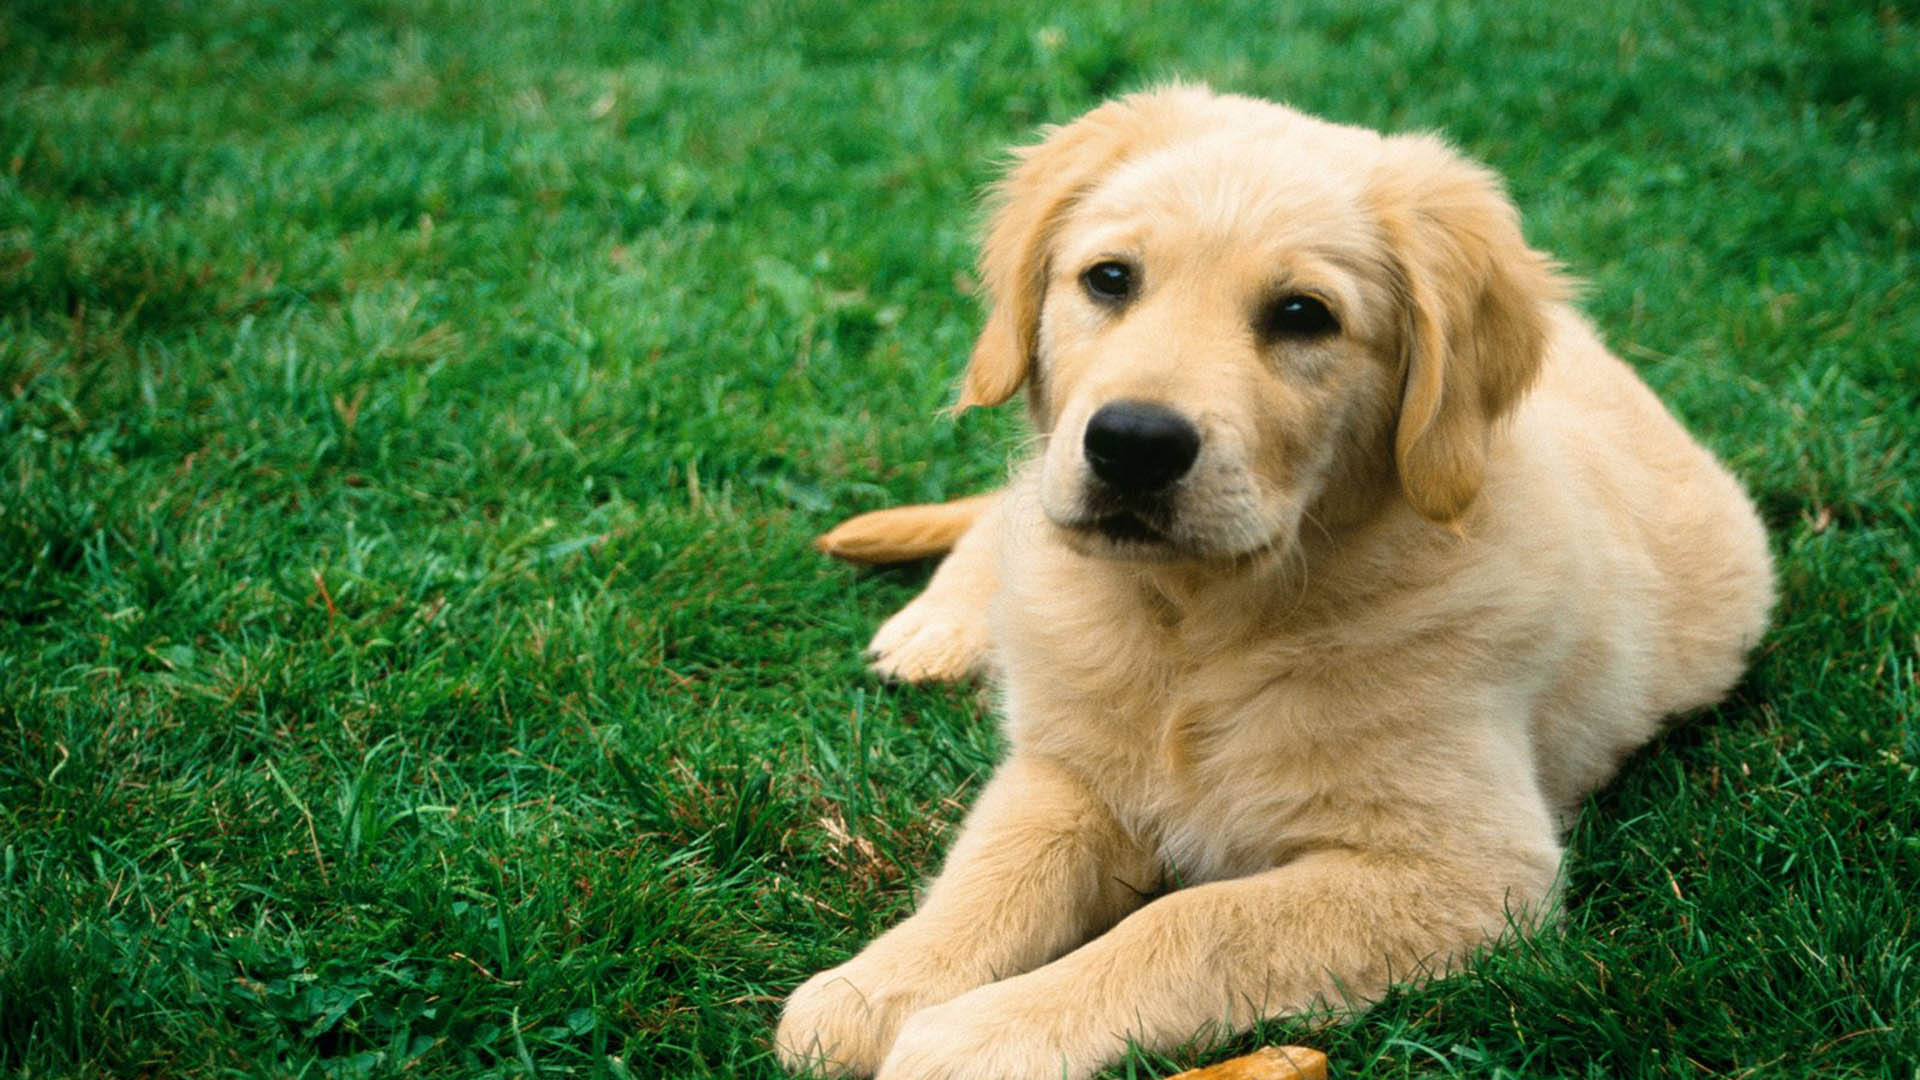 dog 1920x1080 dog 1920x1080 wallpaper dog 1920x1080 picture dog 1920x1080